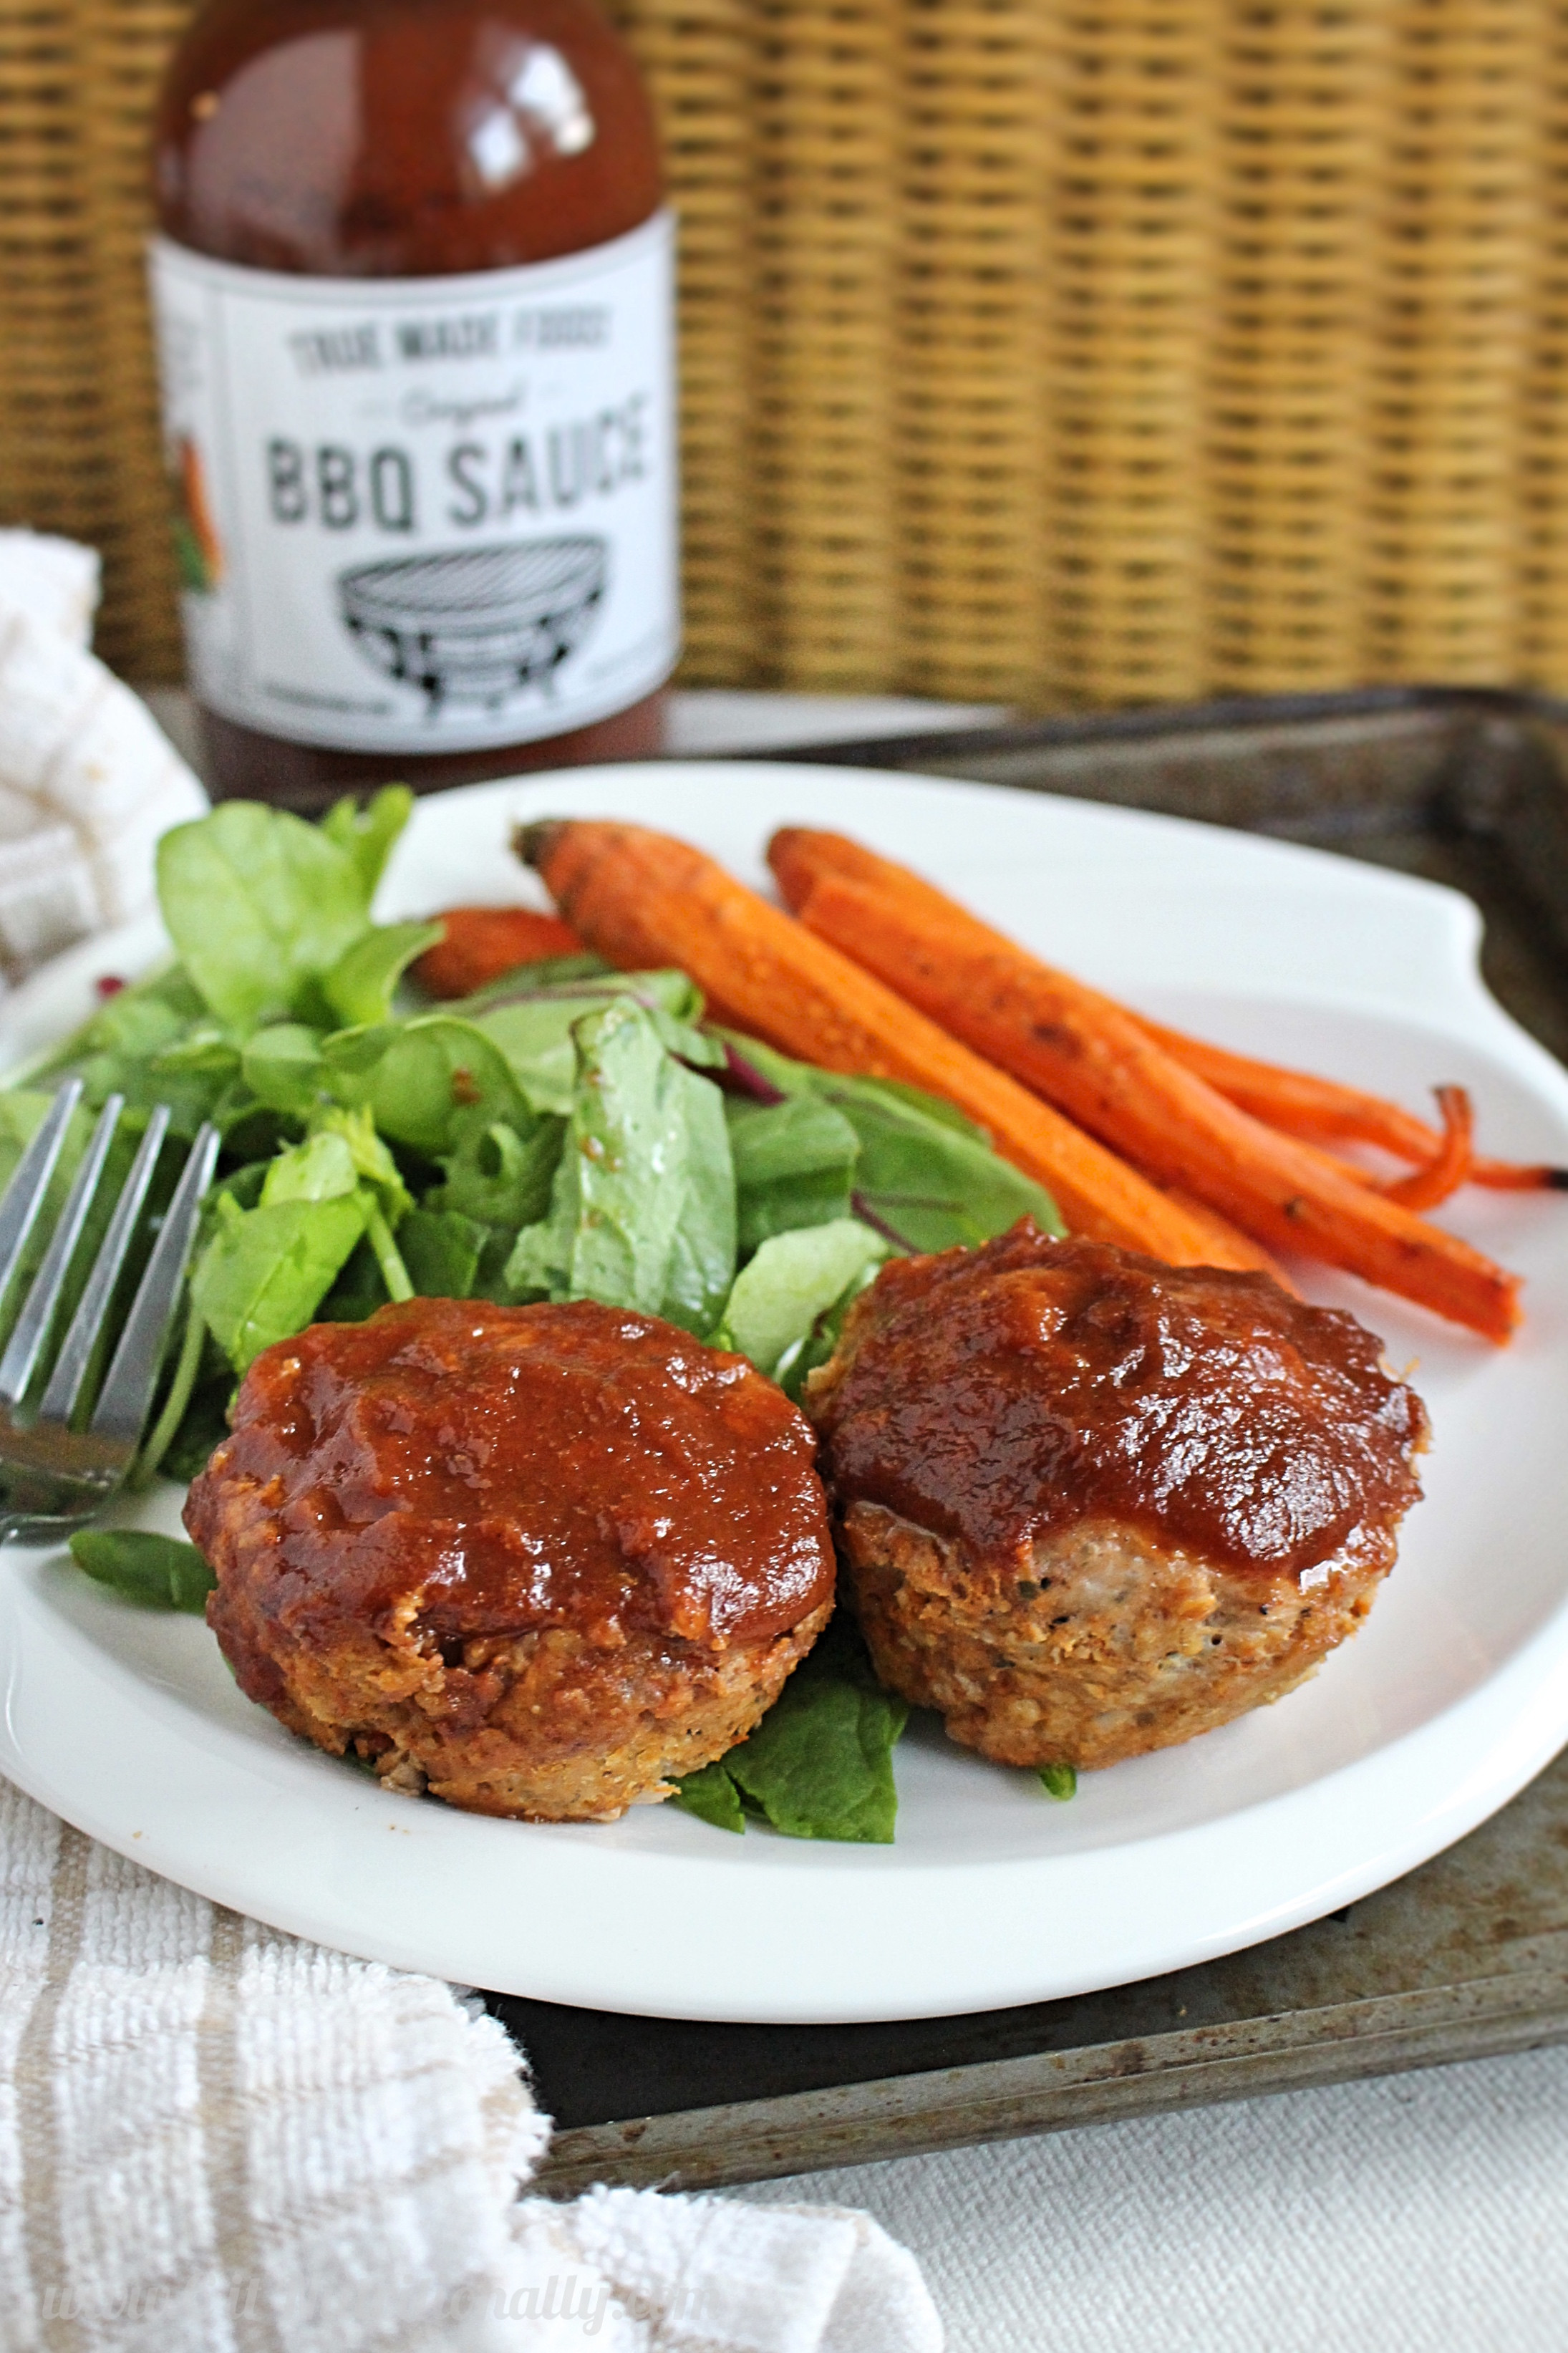 Healthy Turkey Meatloaf Muffins  Healthy Turkey Meatloaf Muffins Frugal Friday Week 6 C